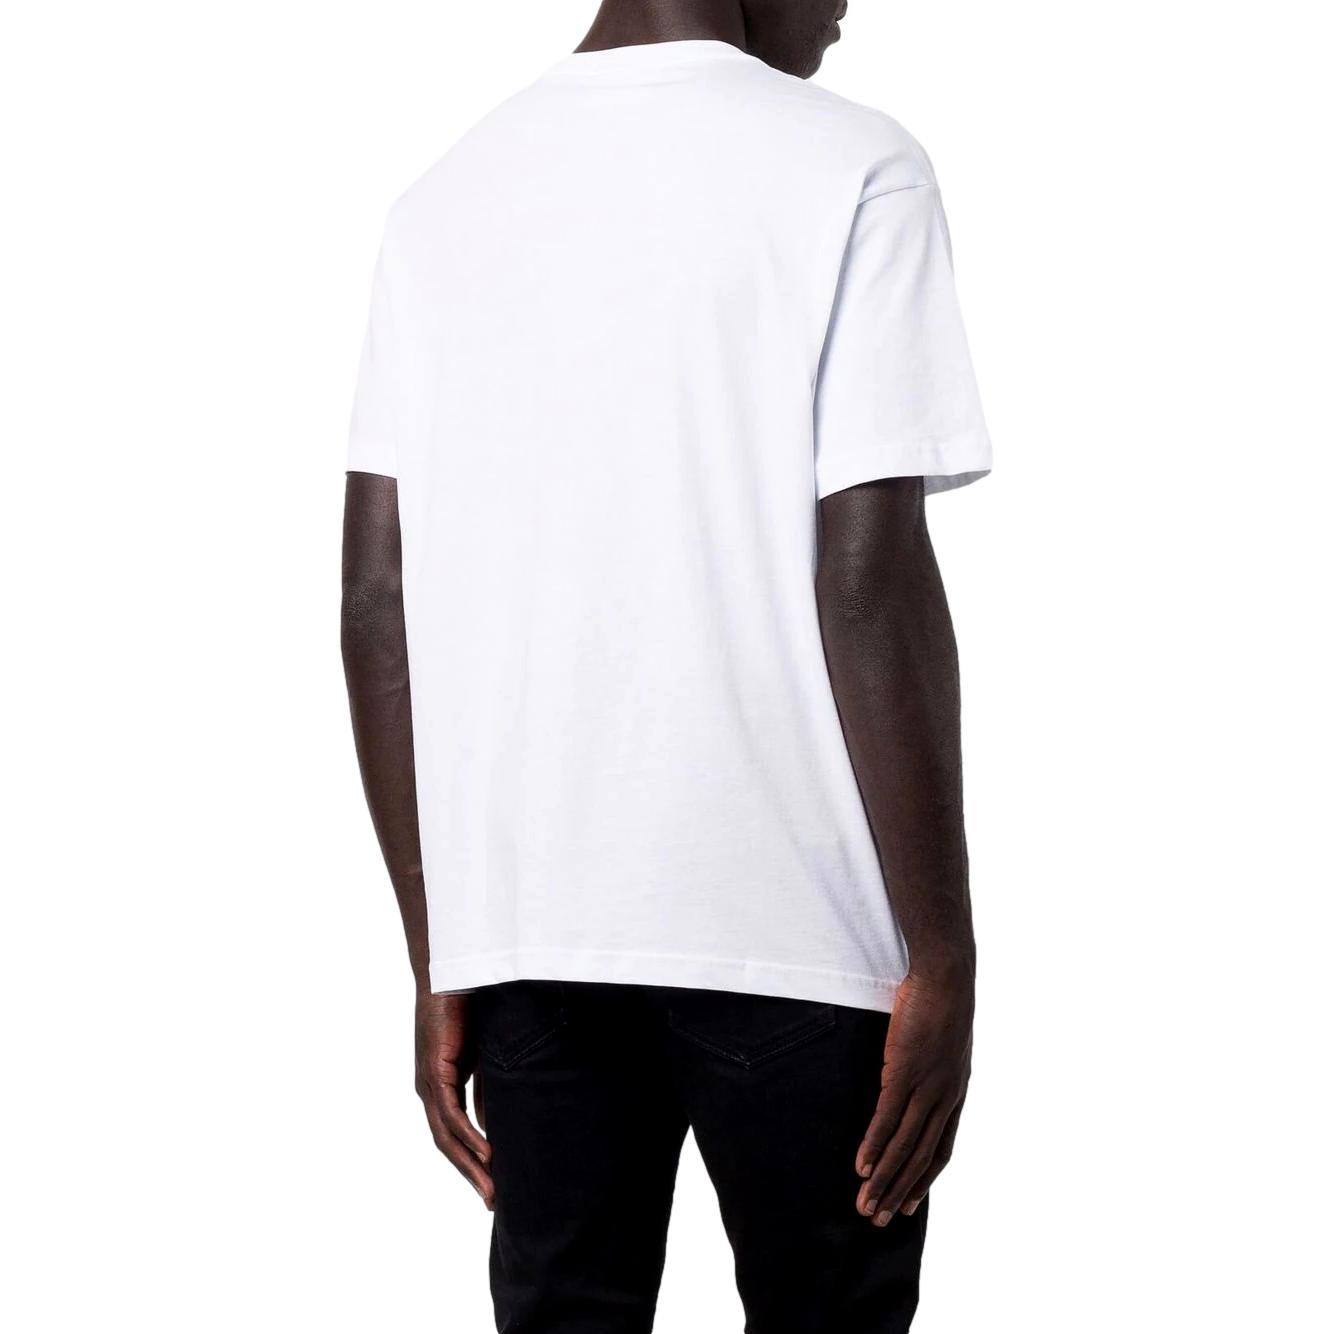 T-shirt girocollo con stampa riflettente VERSACE JEANS COUTURE   T-shirt   71GAHT16 CJ00T003